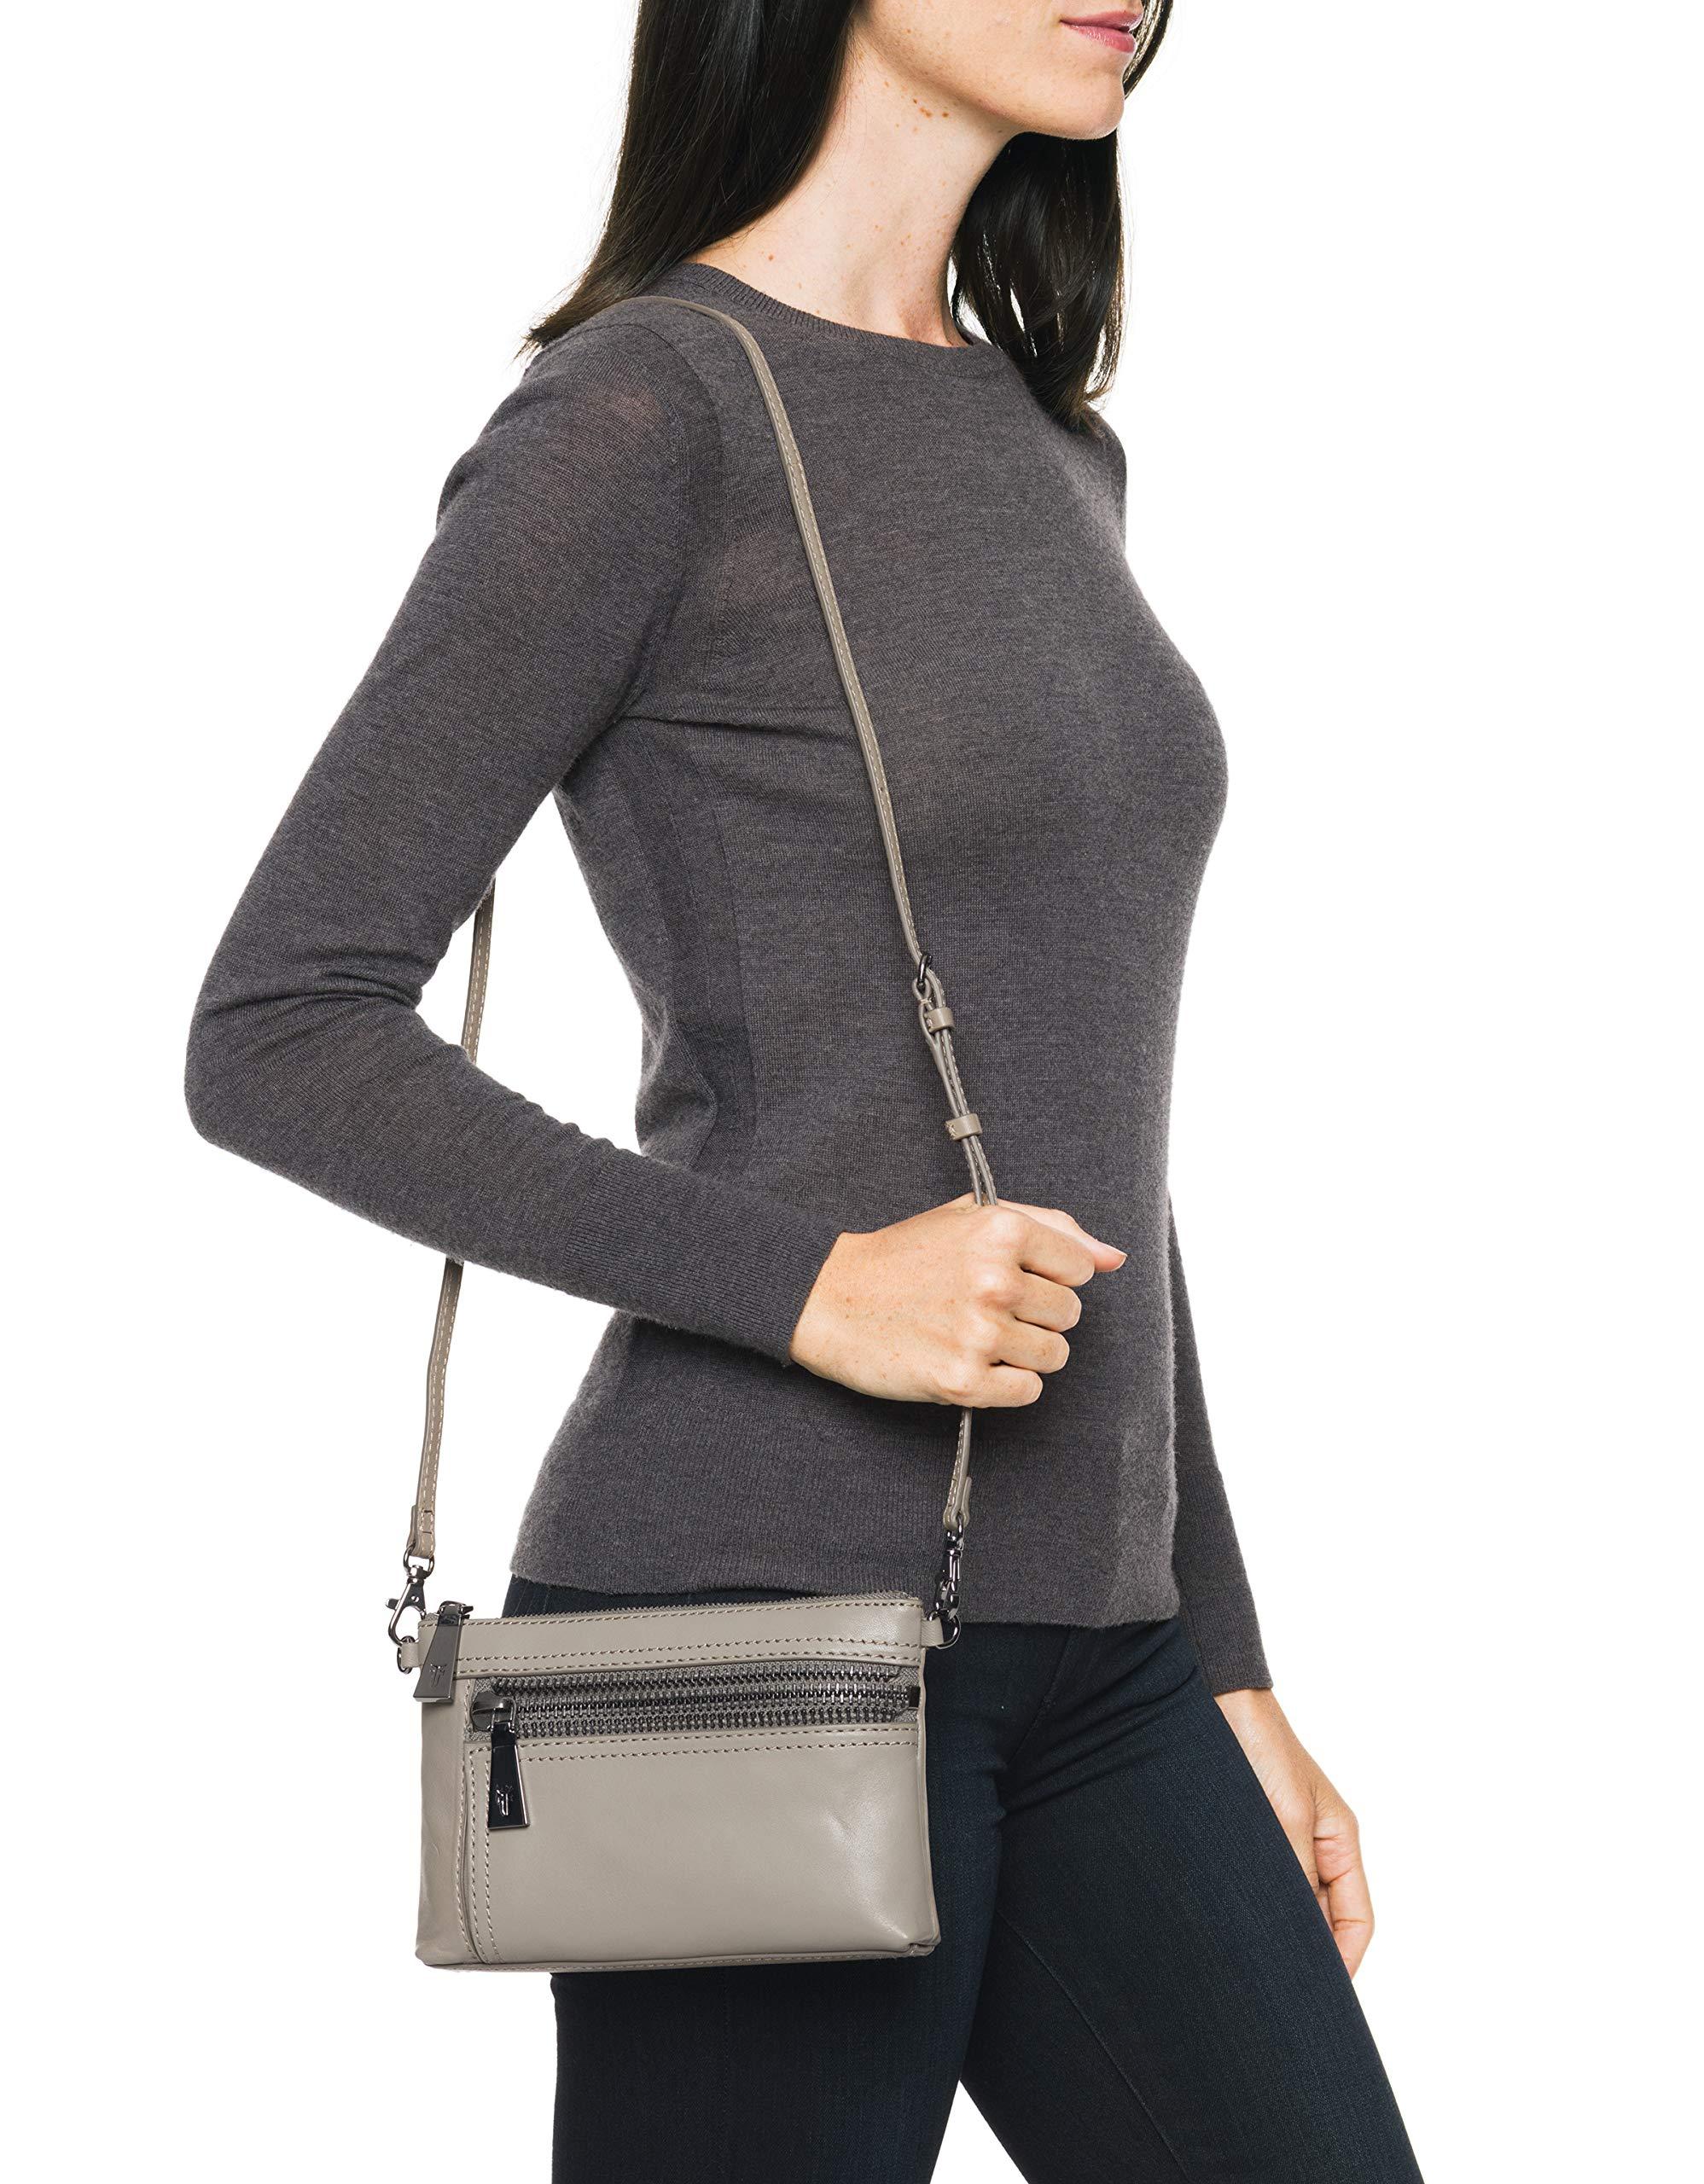 FRYE Lena Zip Leather Crossbody Wristlet Bag, grey by FRYE (Image #6)